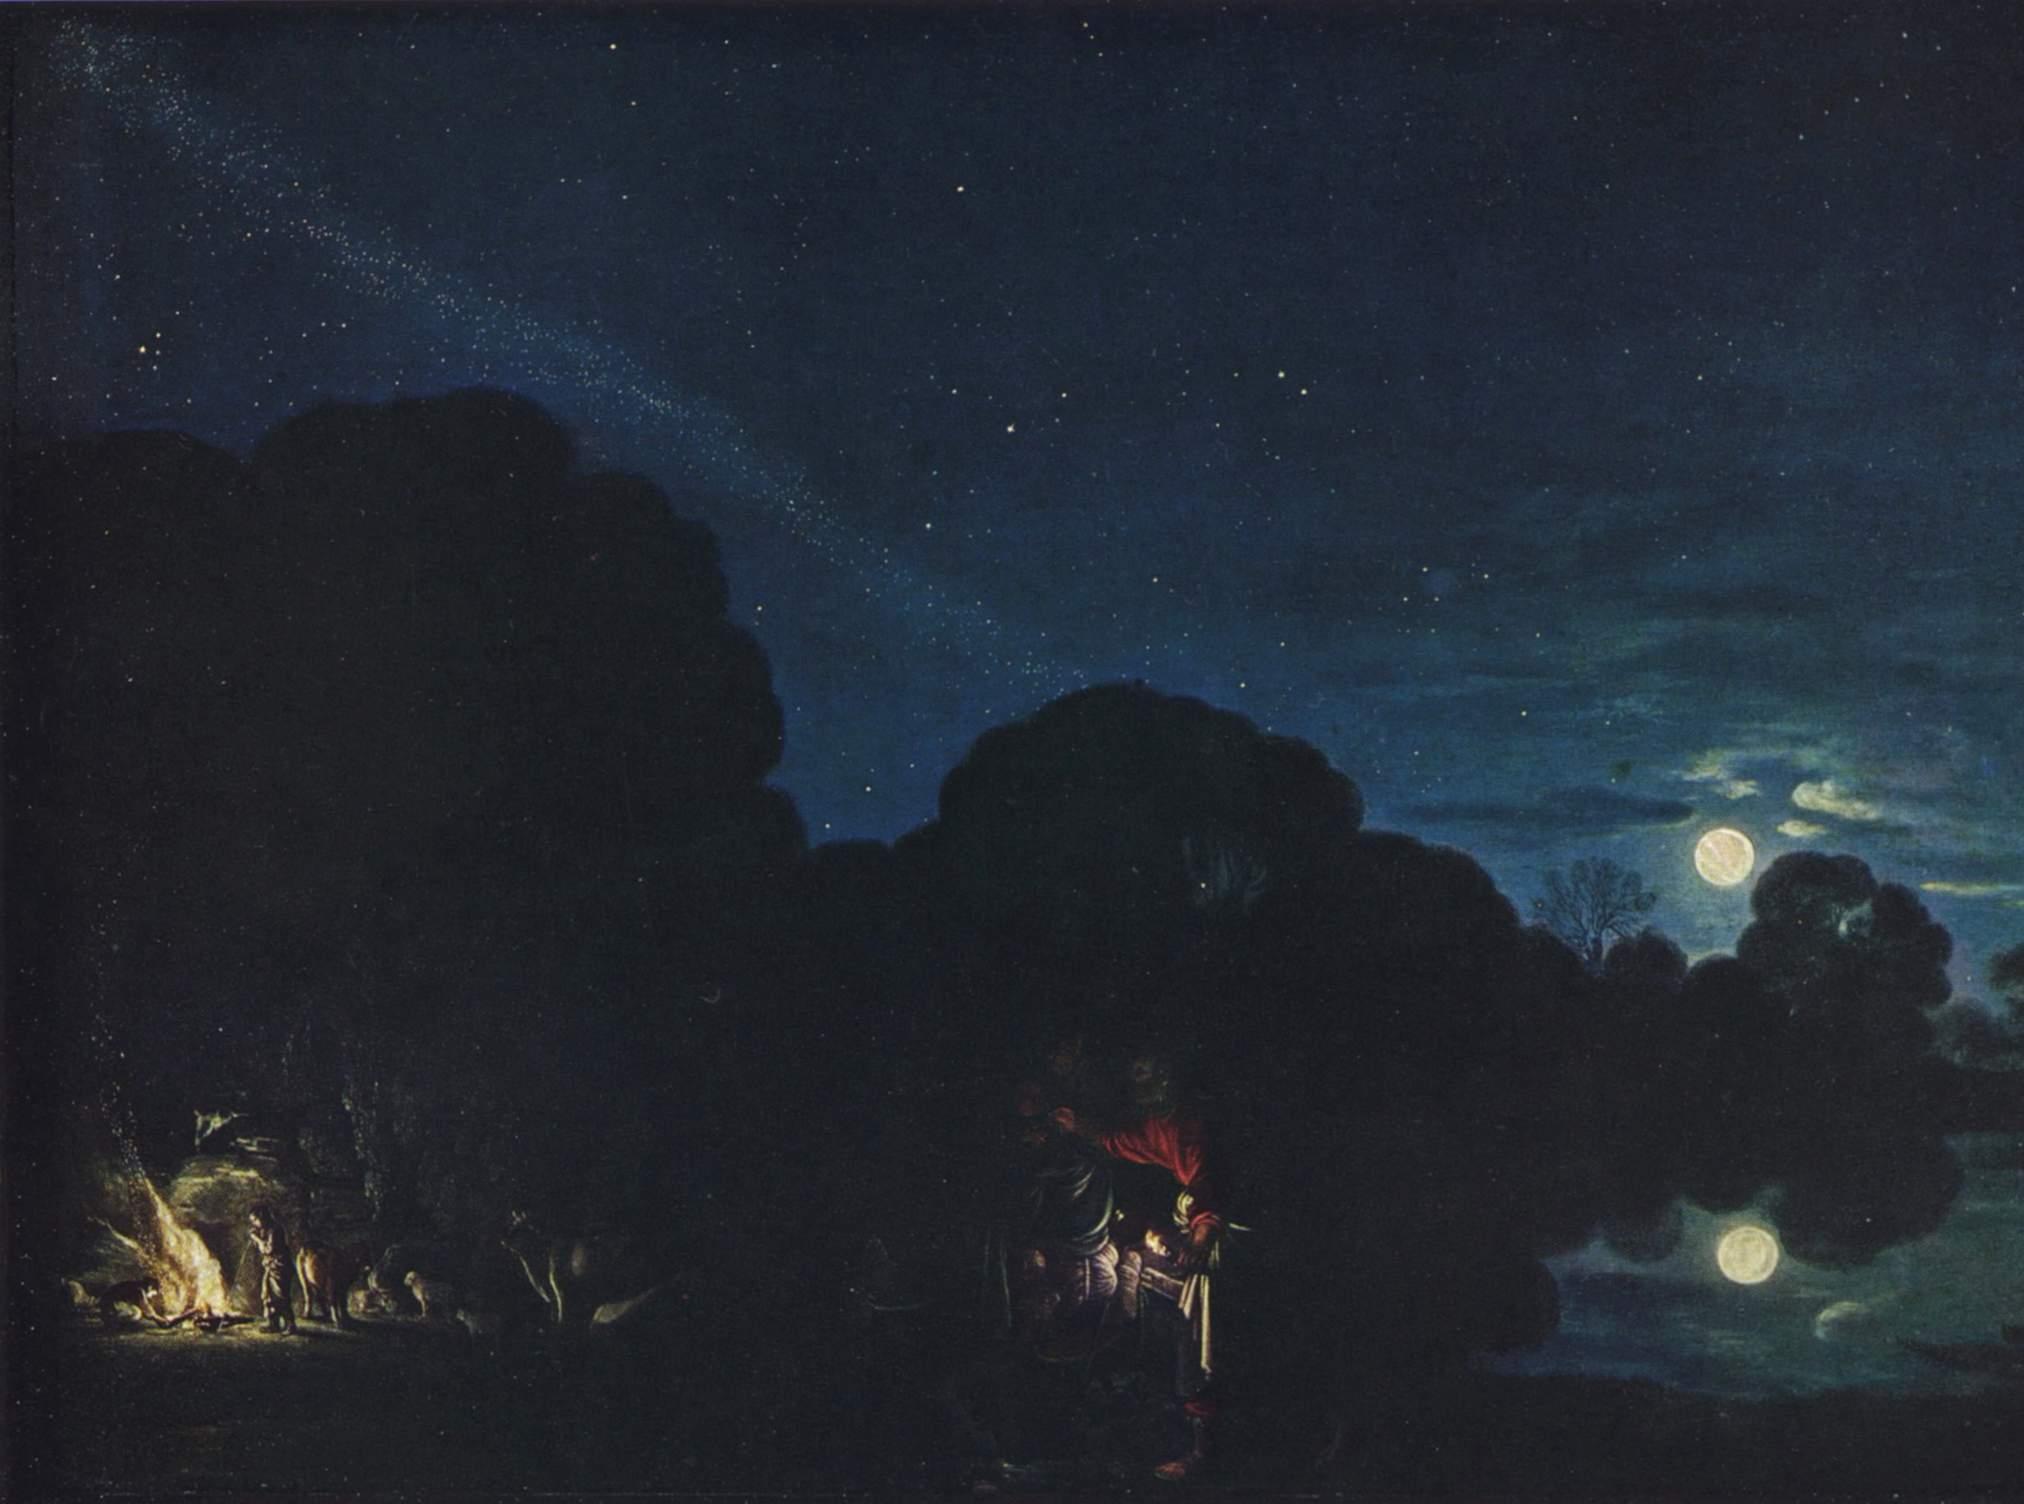 Noc (Bahdanowicz)